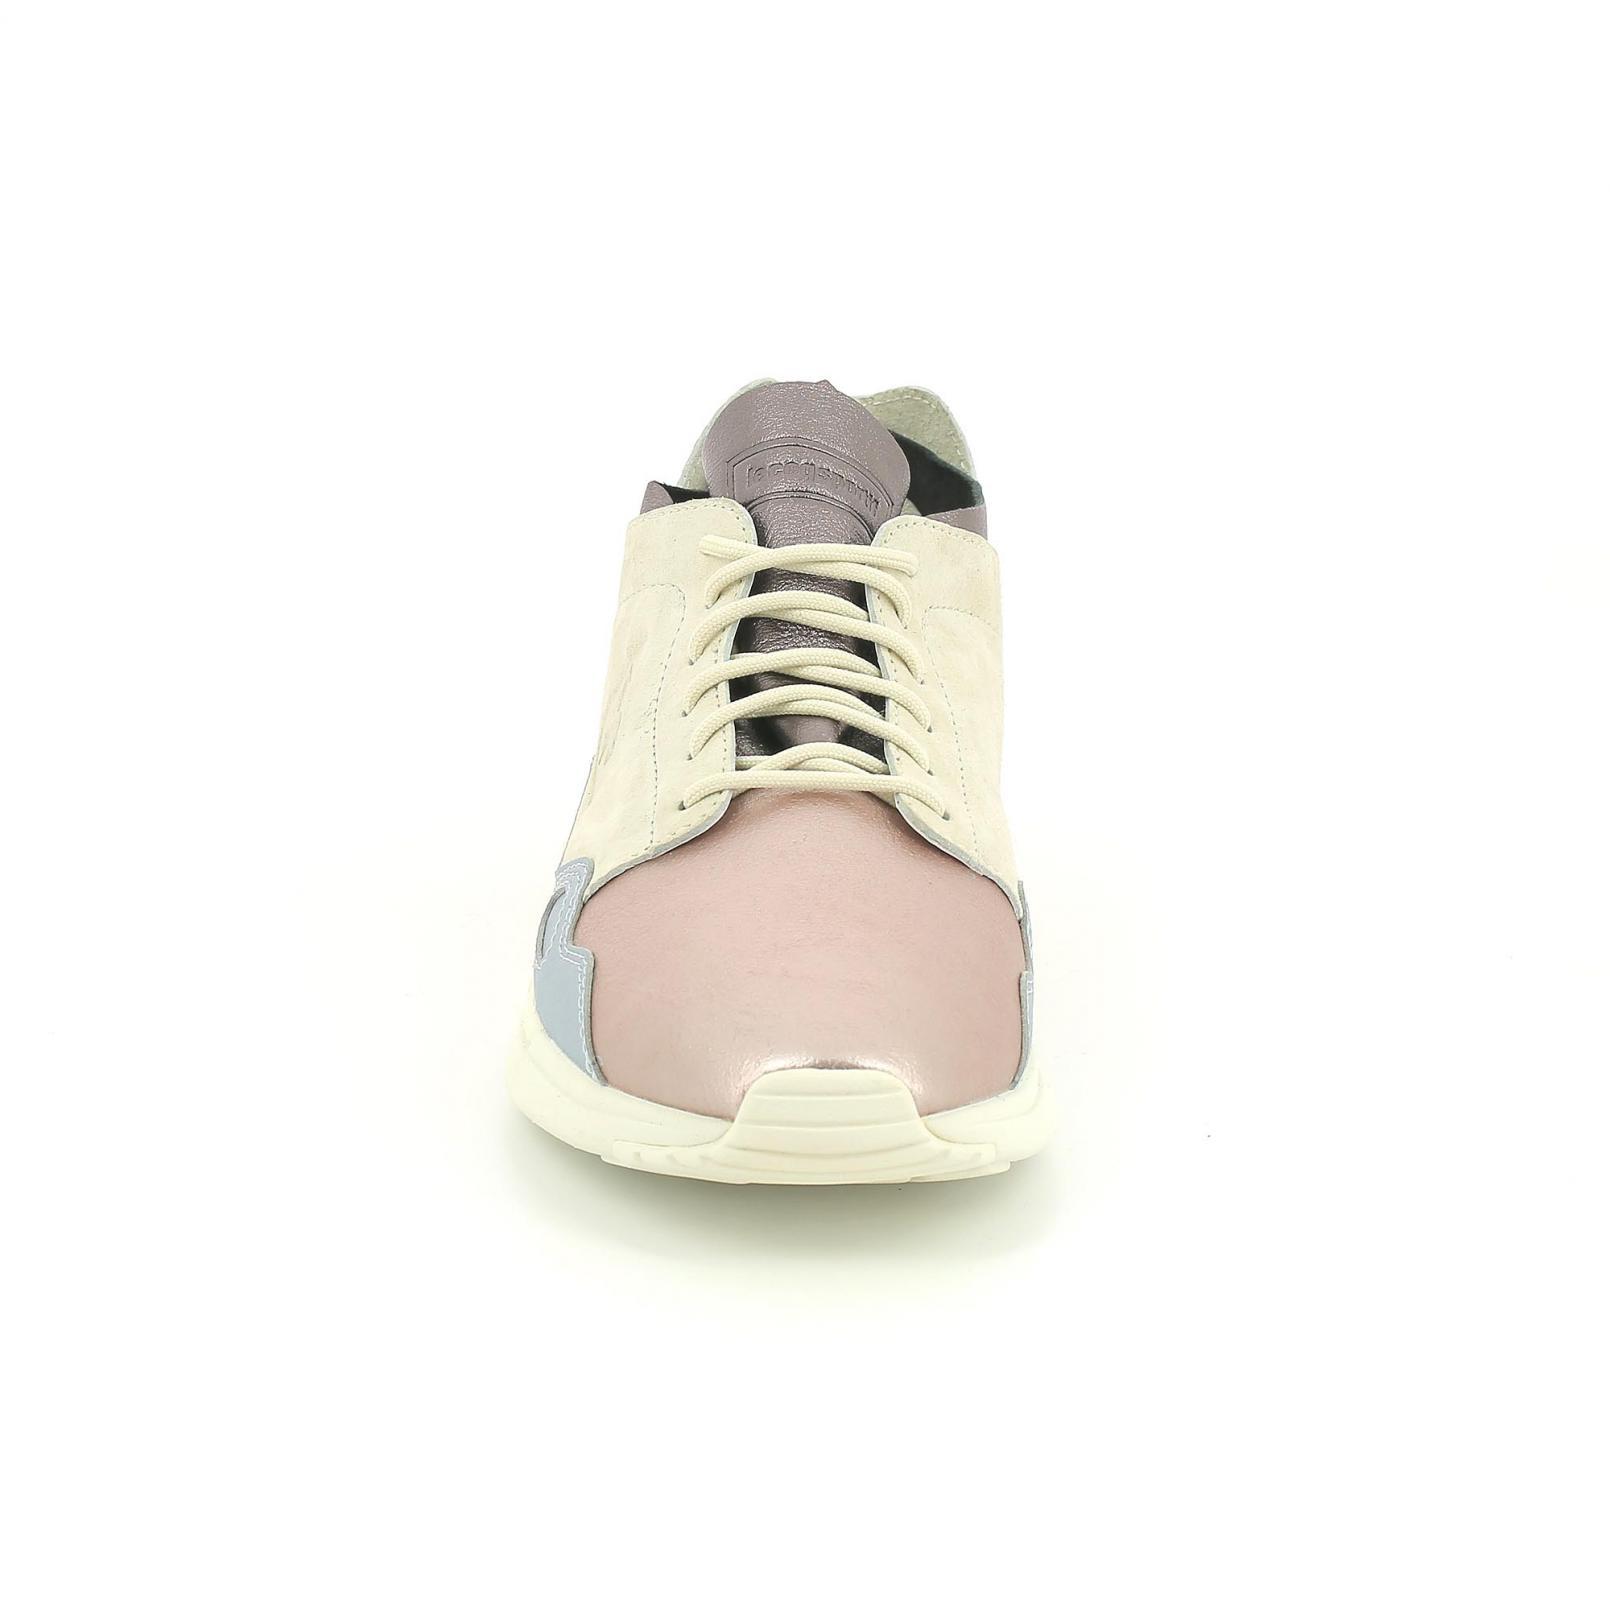 Shoes – Le Coq Sportif Lcs R Flow W Metallic Leather Mix Multicolored